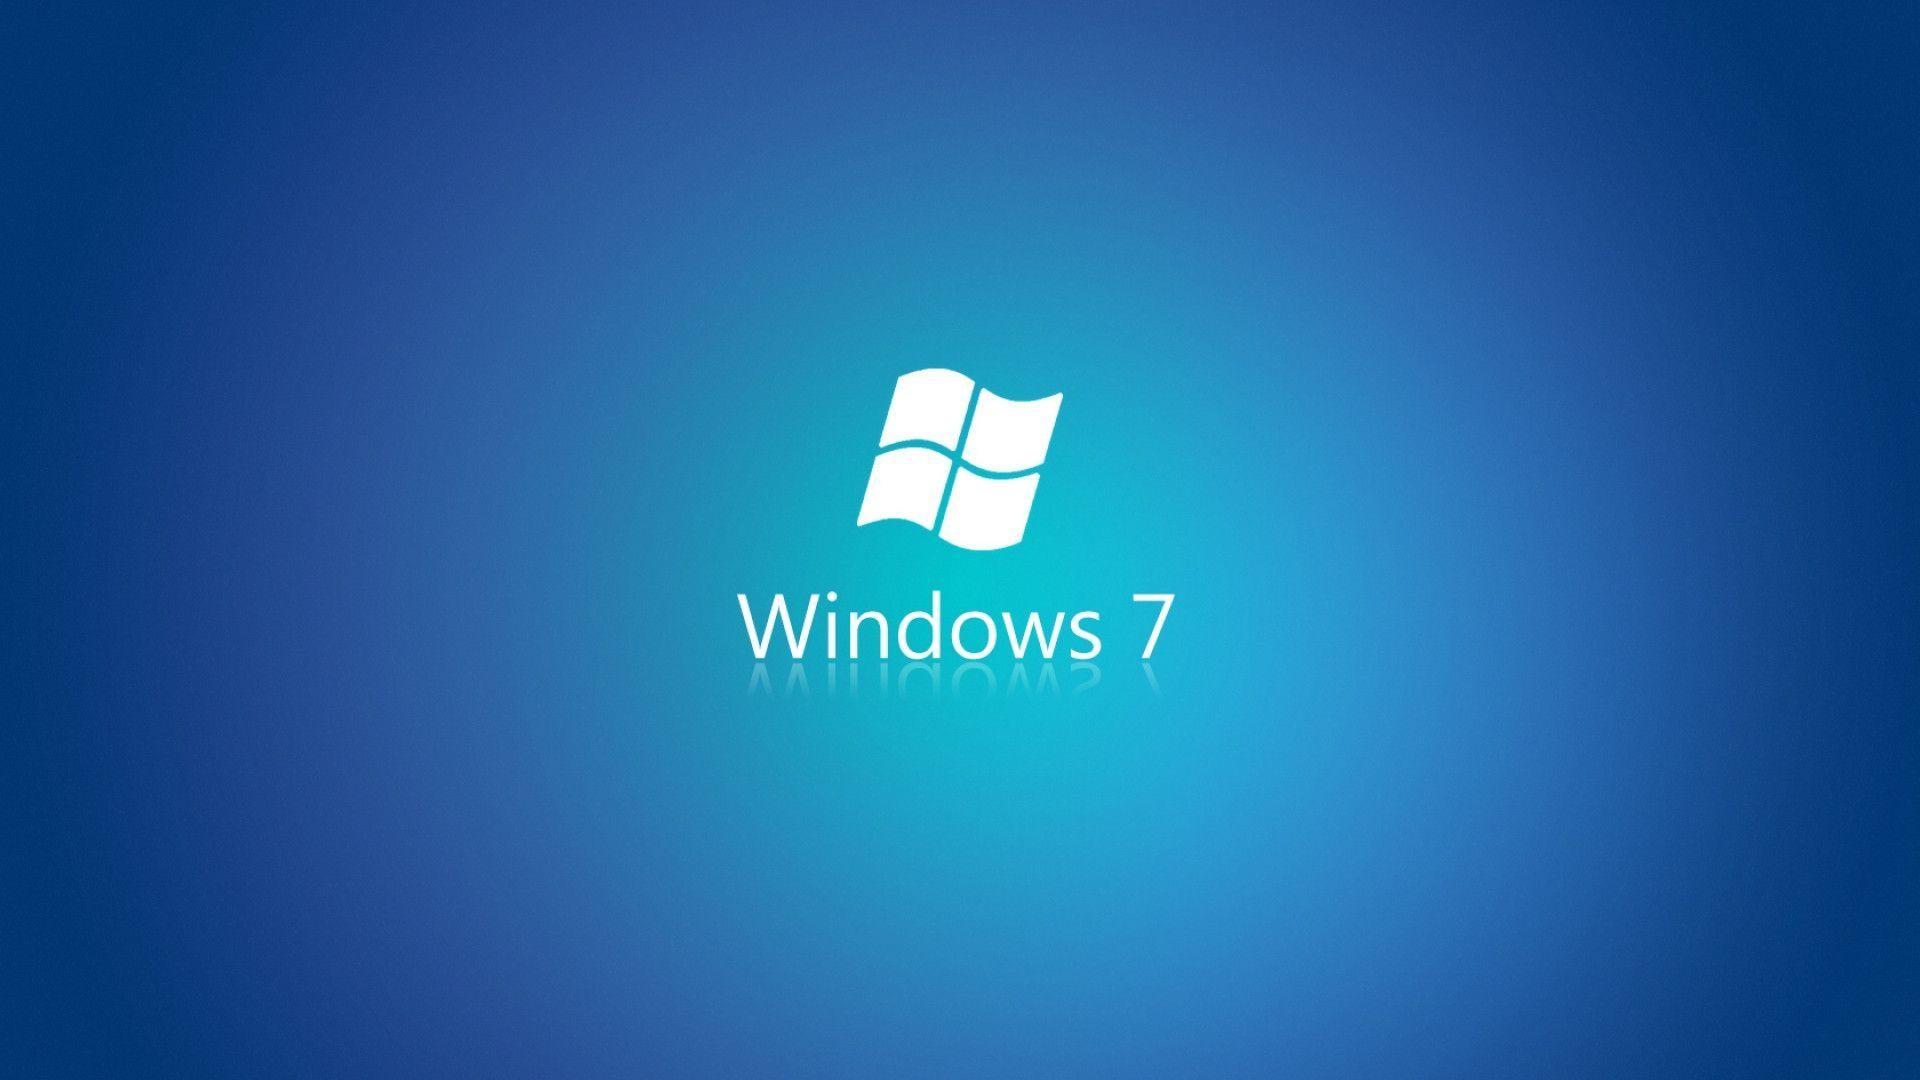 windows logo wallpaper 183��